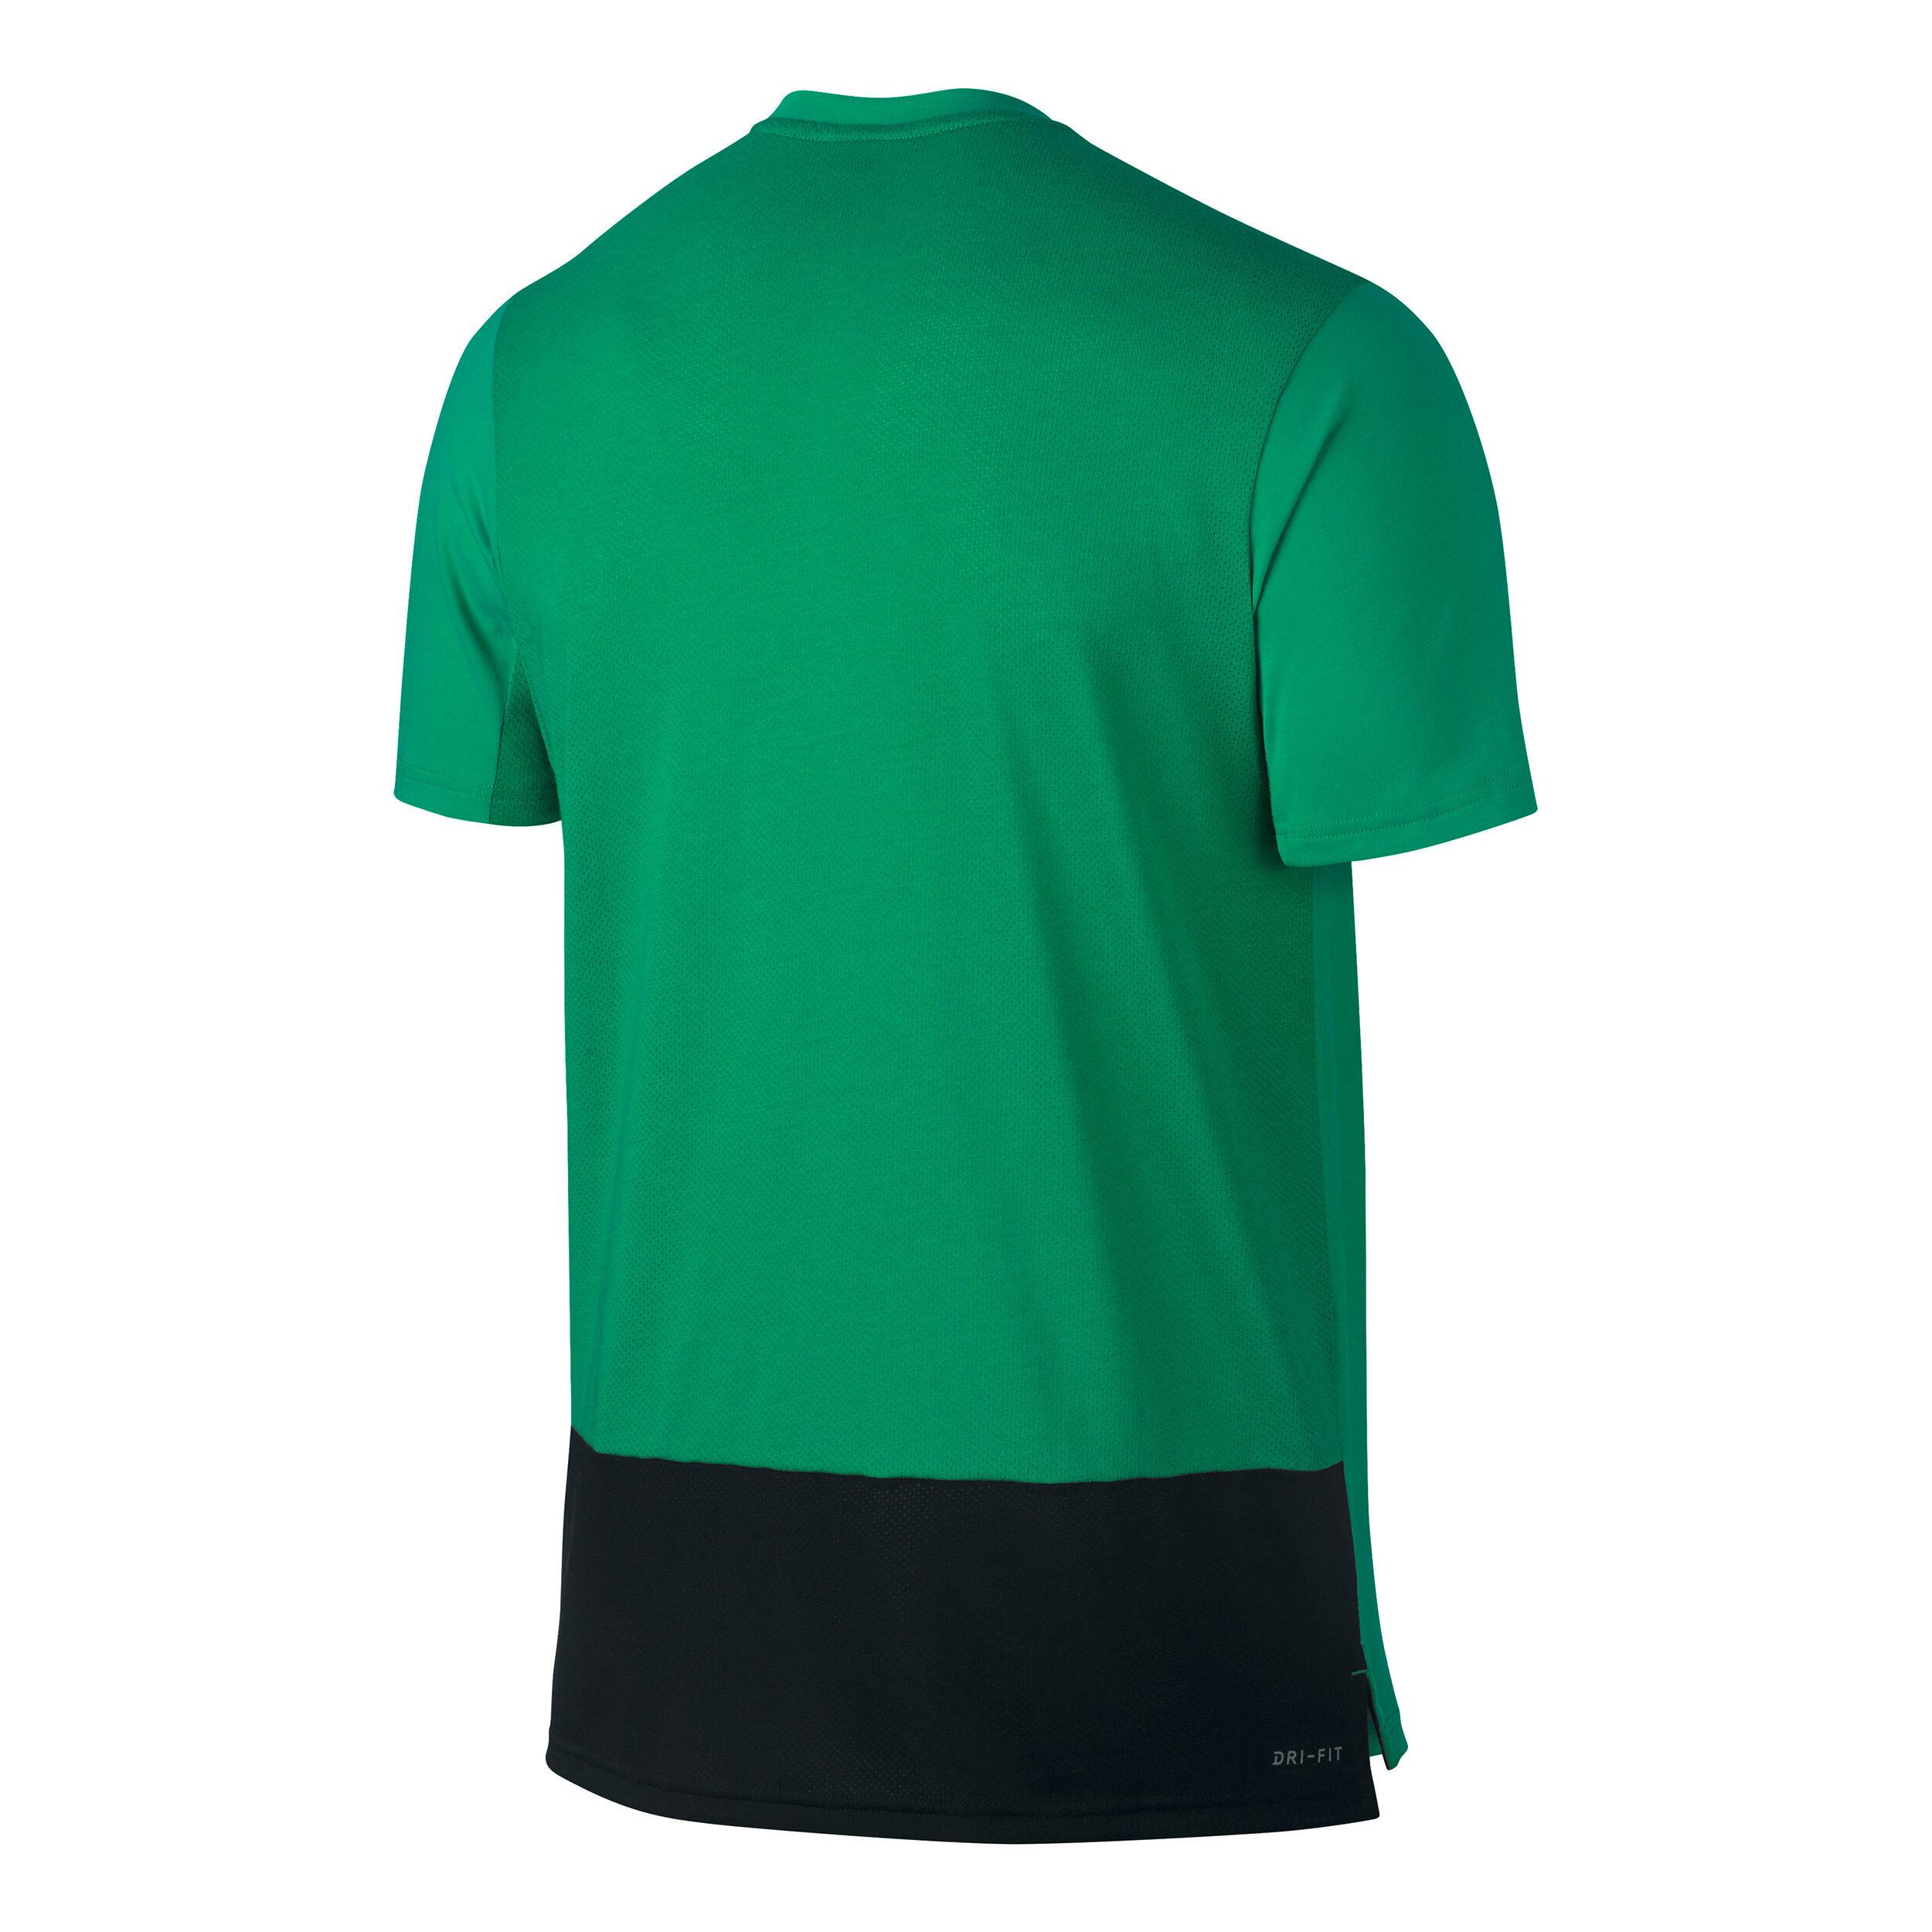 Nike Court Dry Baseline T Shirt Herren Neongrün, Schwarz